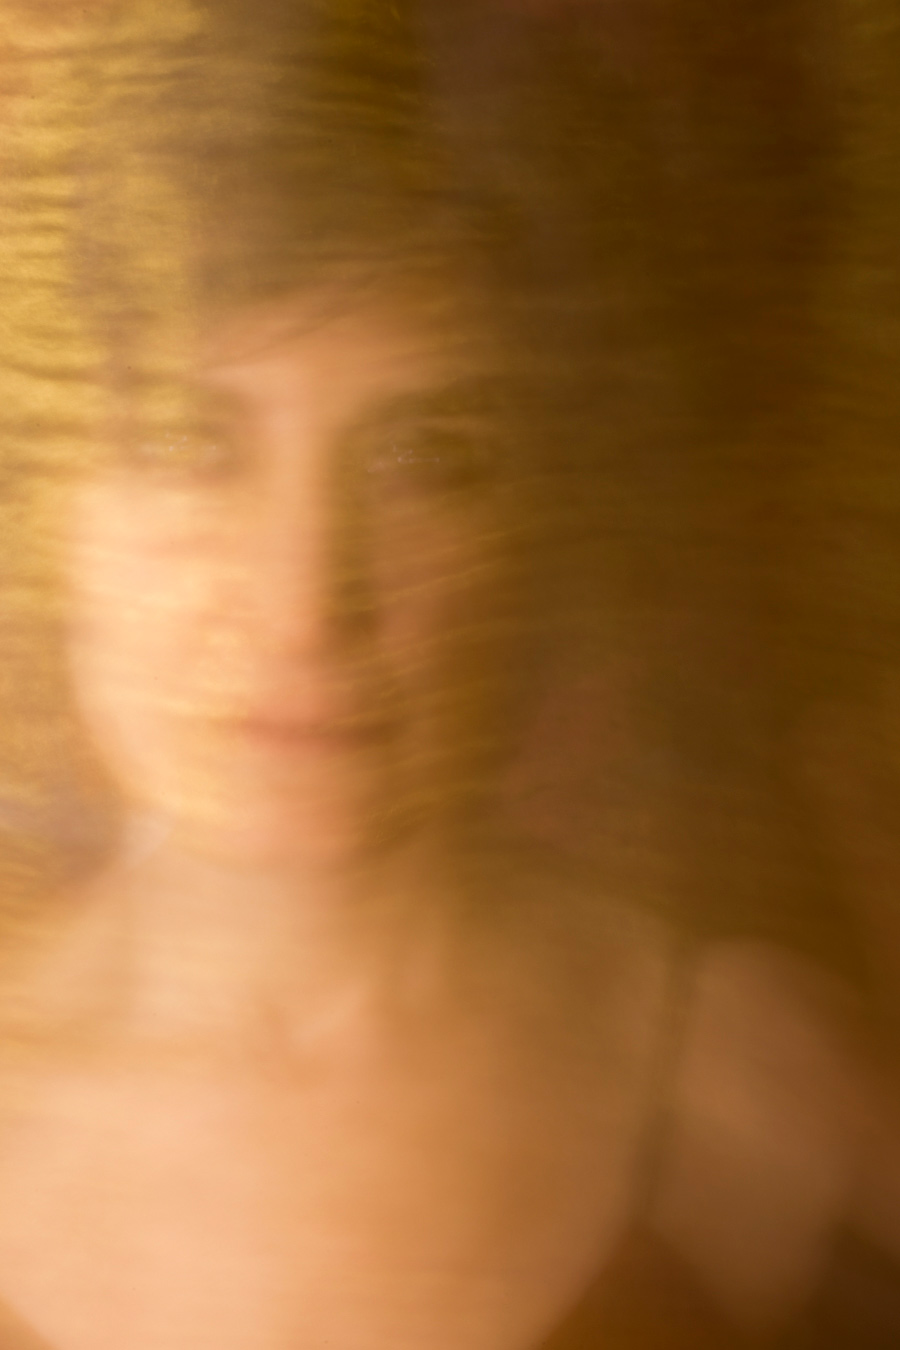 Il-dono-piu-bello-Fenice-ritratti-light-painting-allebonicalzi-4